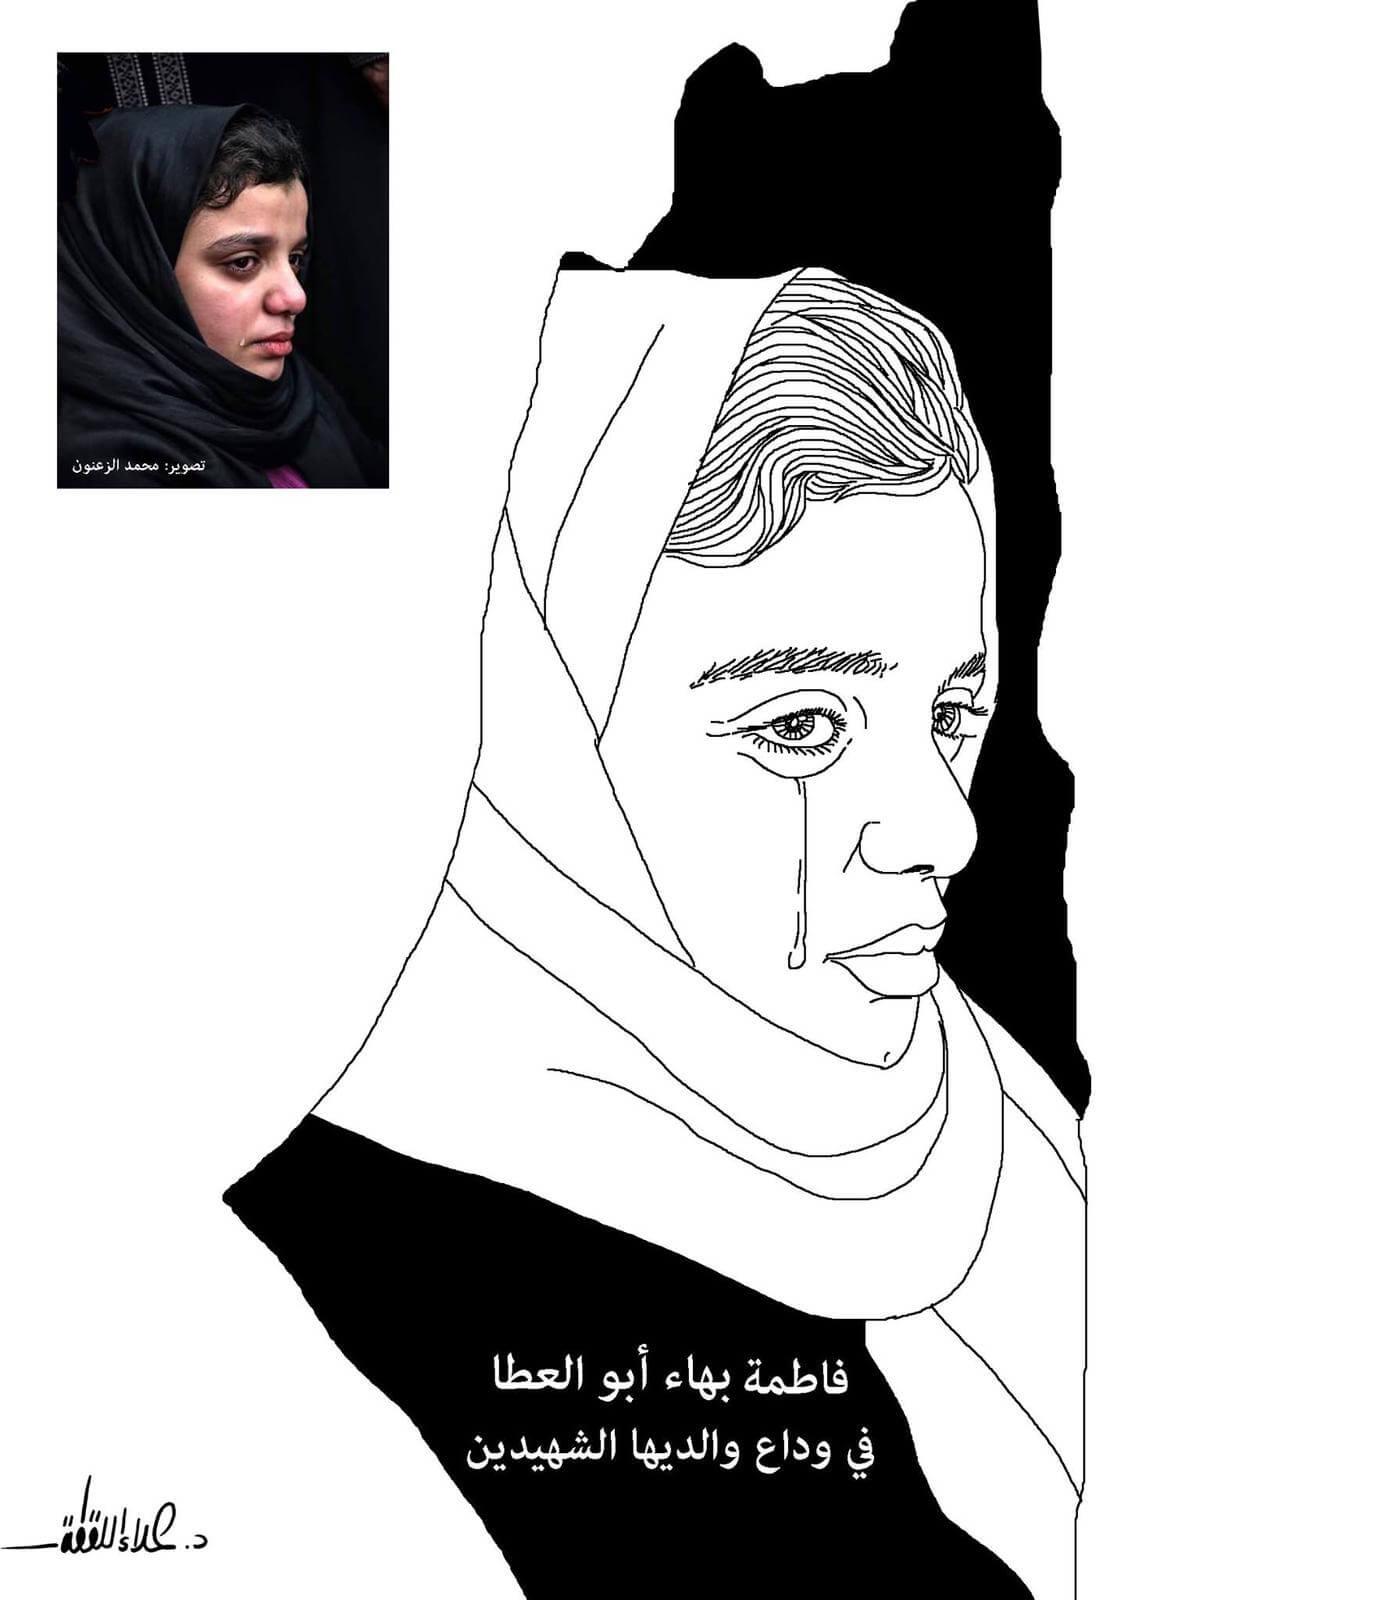 Fatma Abou Al-Ataa by Alaa' Alluqta a renown artist from Gaza. (Image: facebook.com/alaa.allagta)